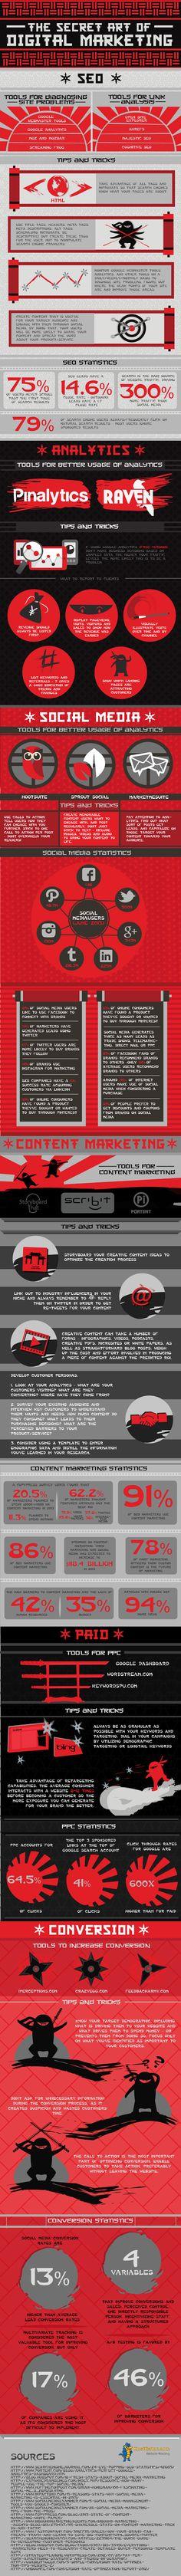 The Secret Art of Digital Marketing.